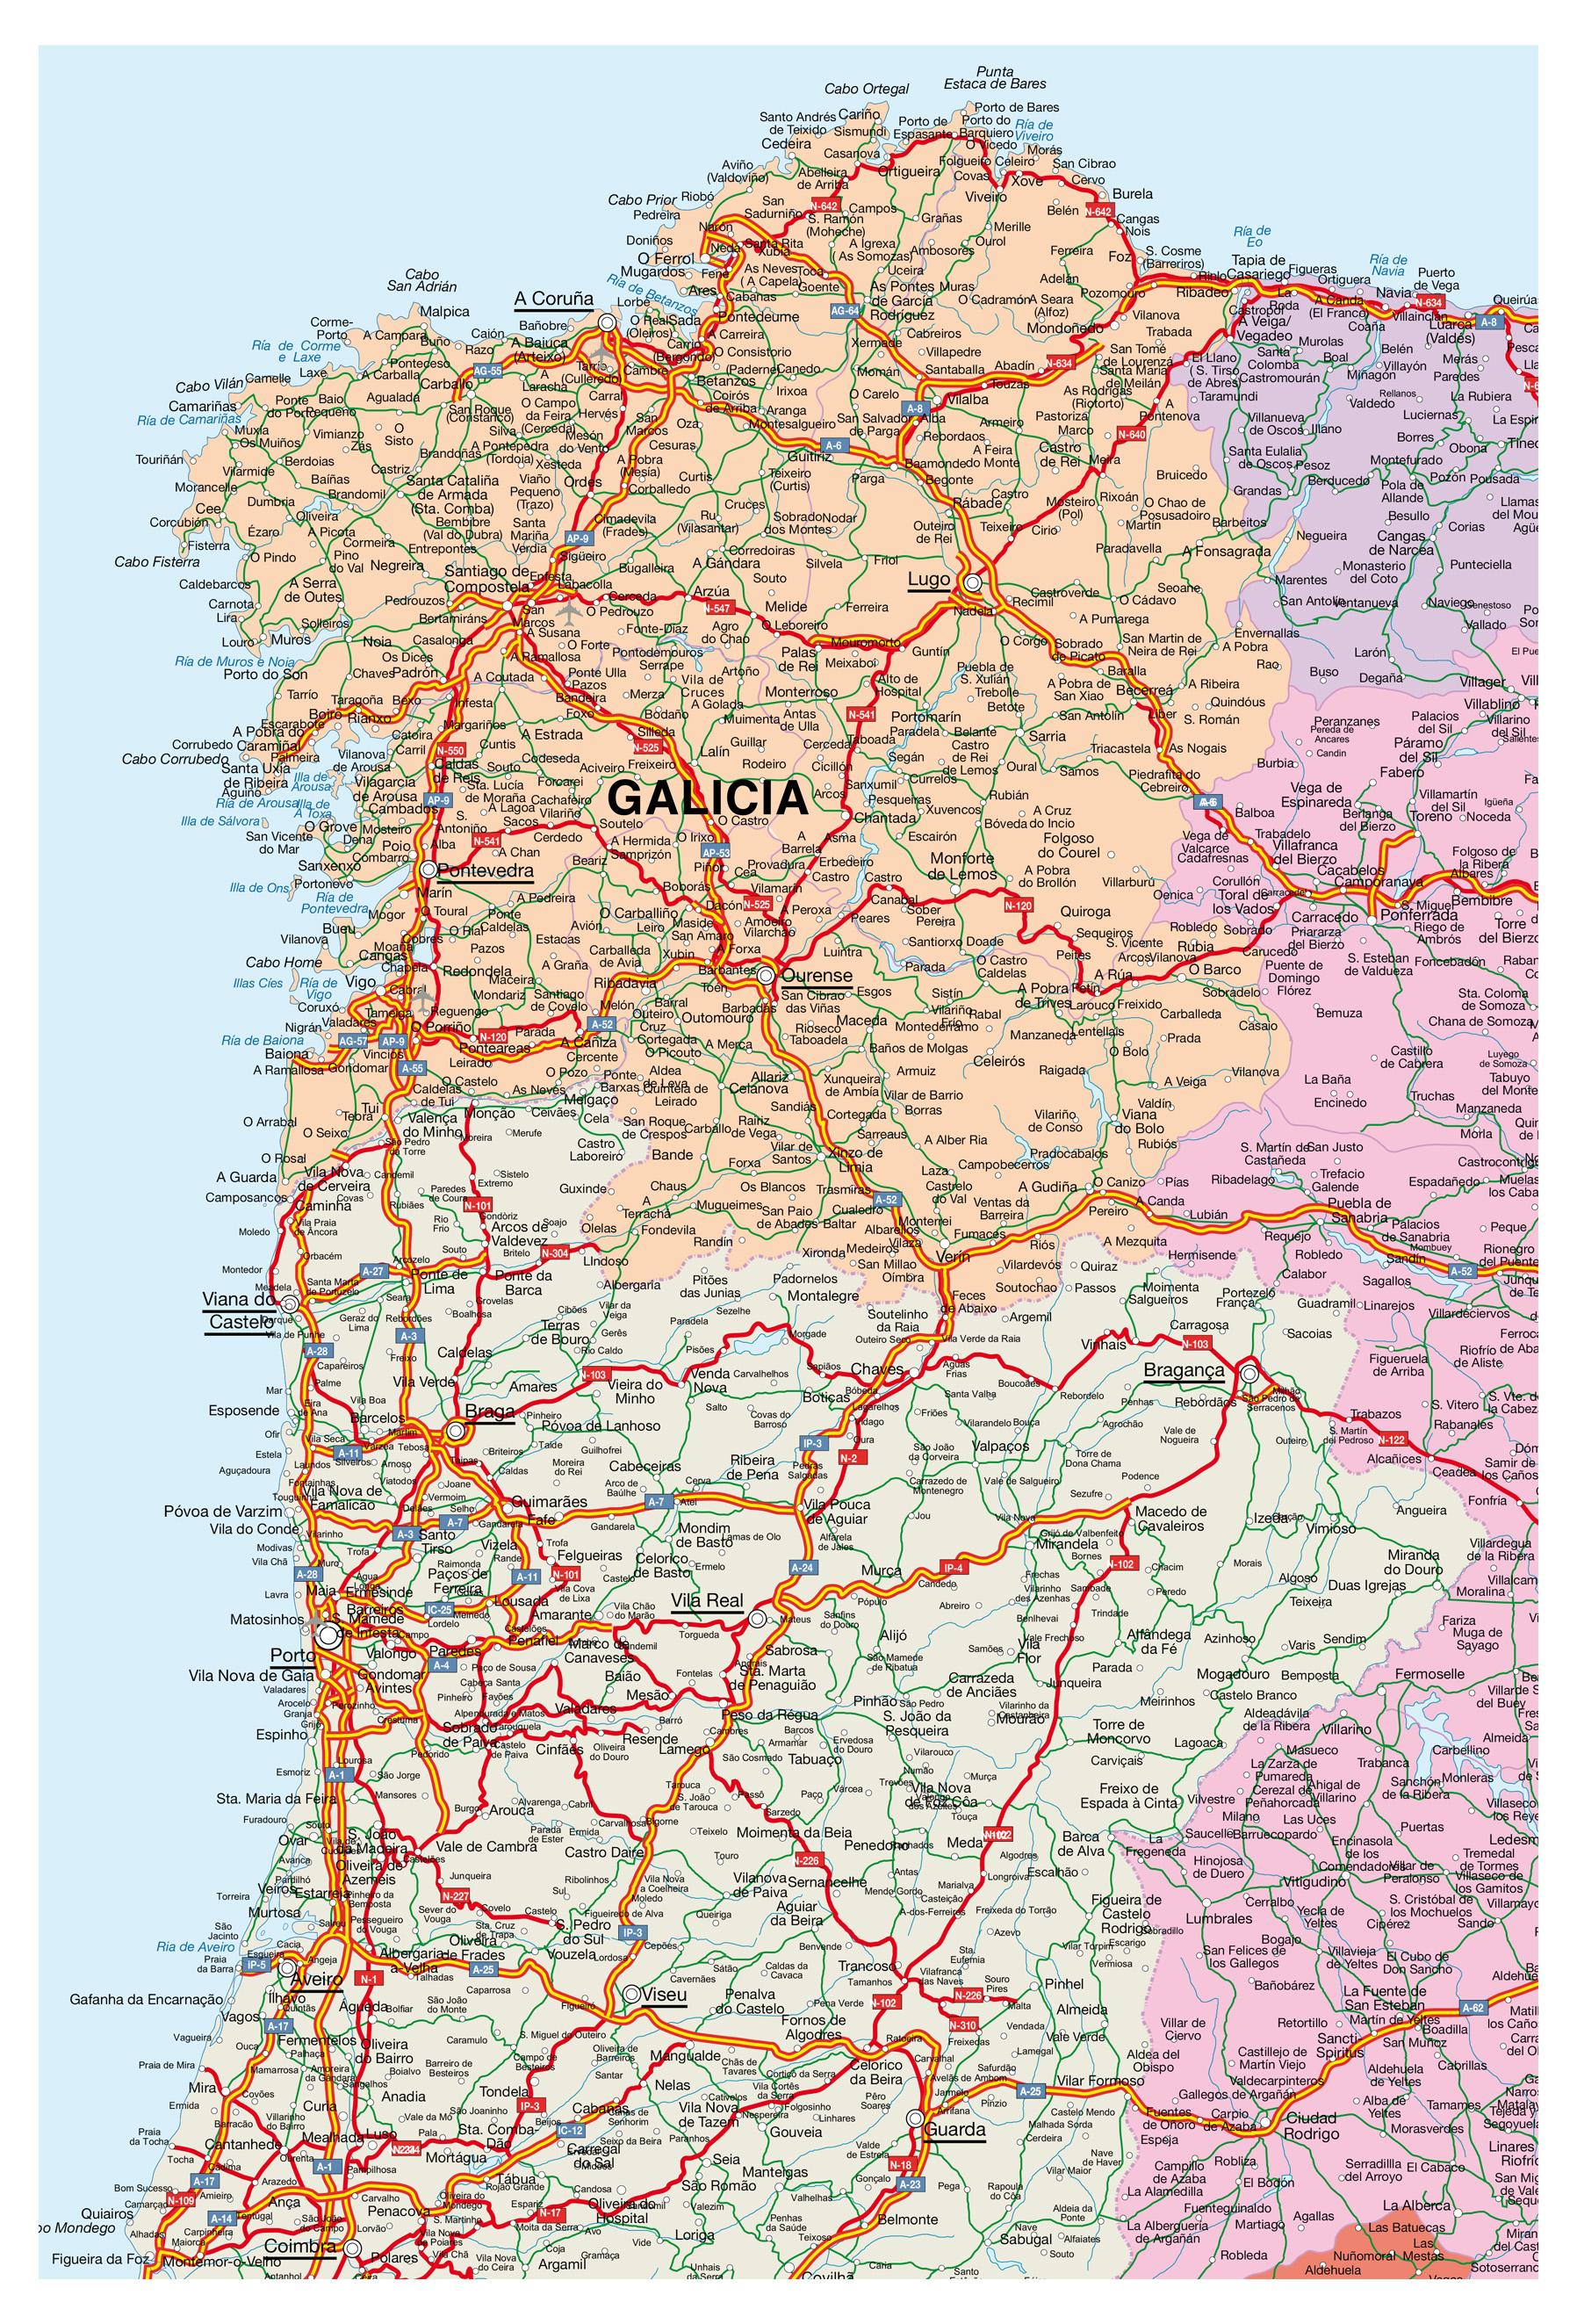 Mapa Vectorial Portugal Illustrator Eps Editable Sag